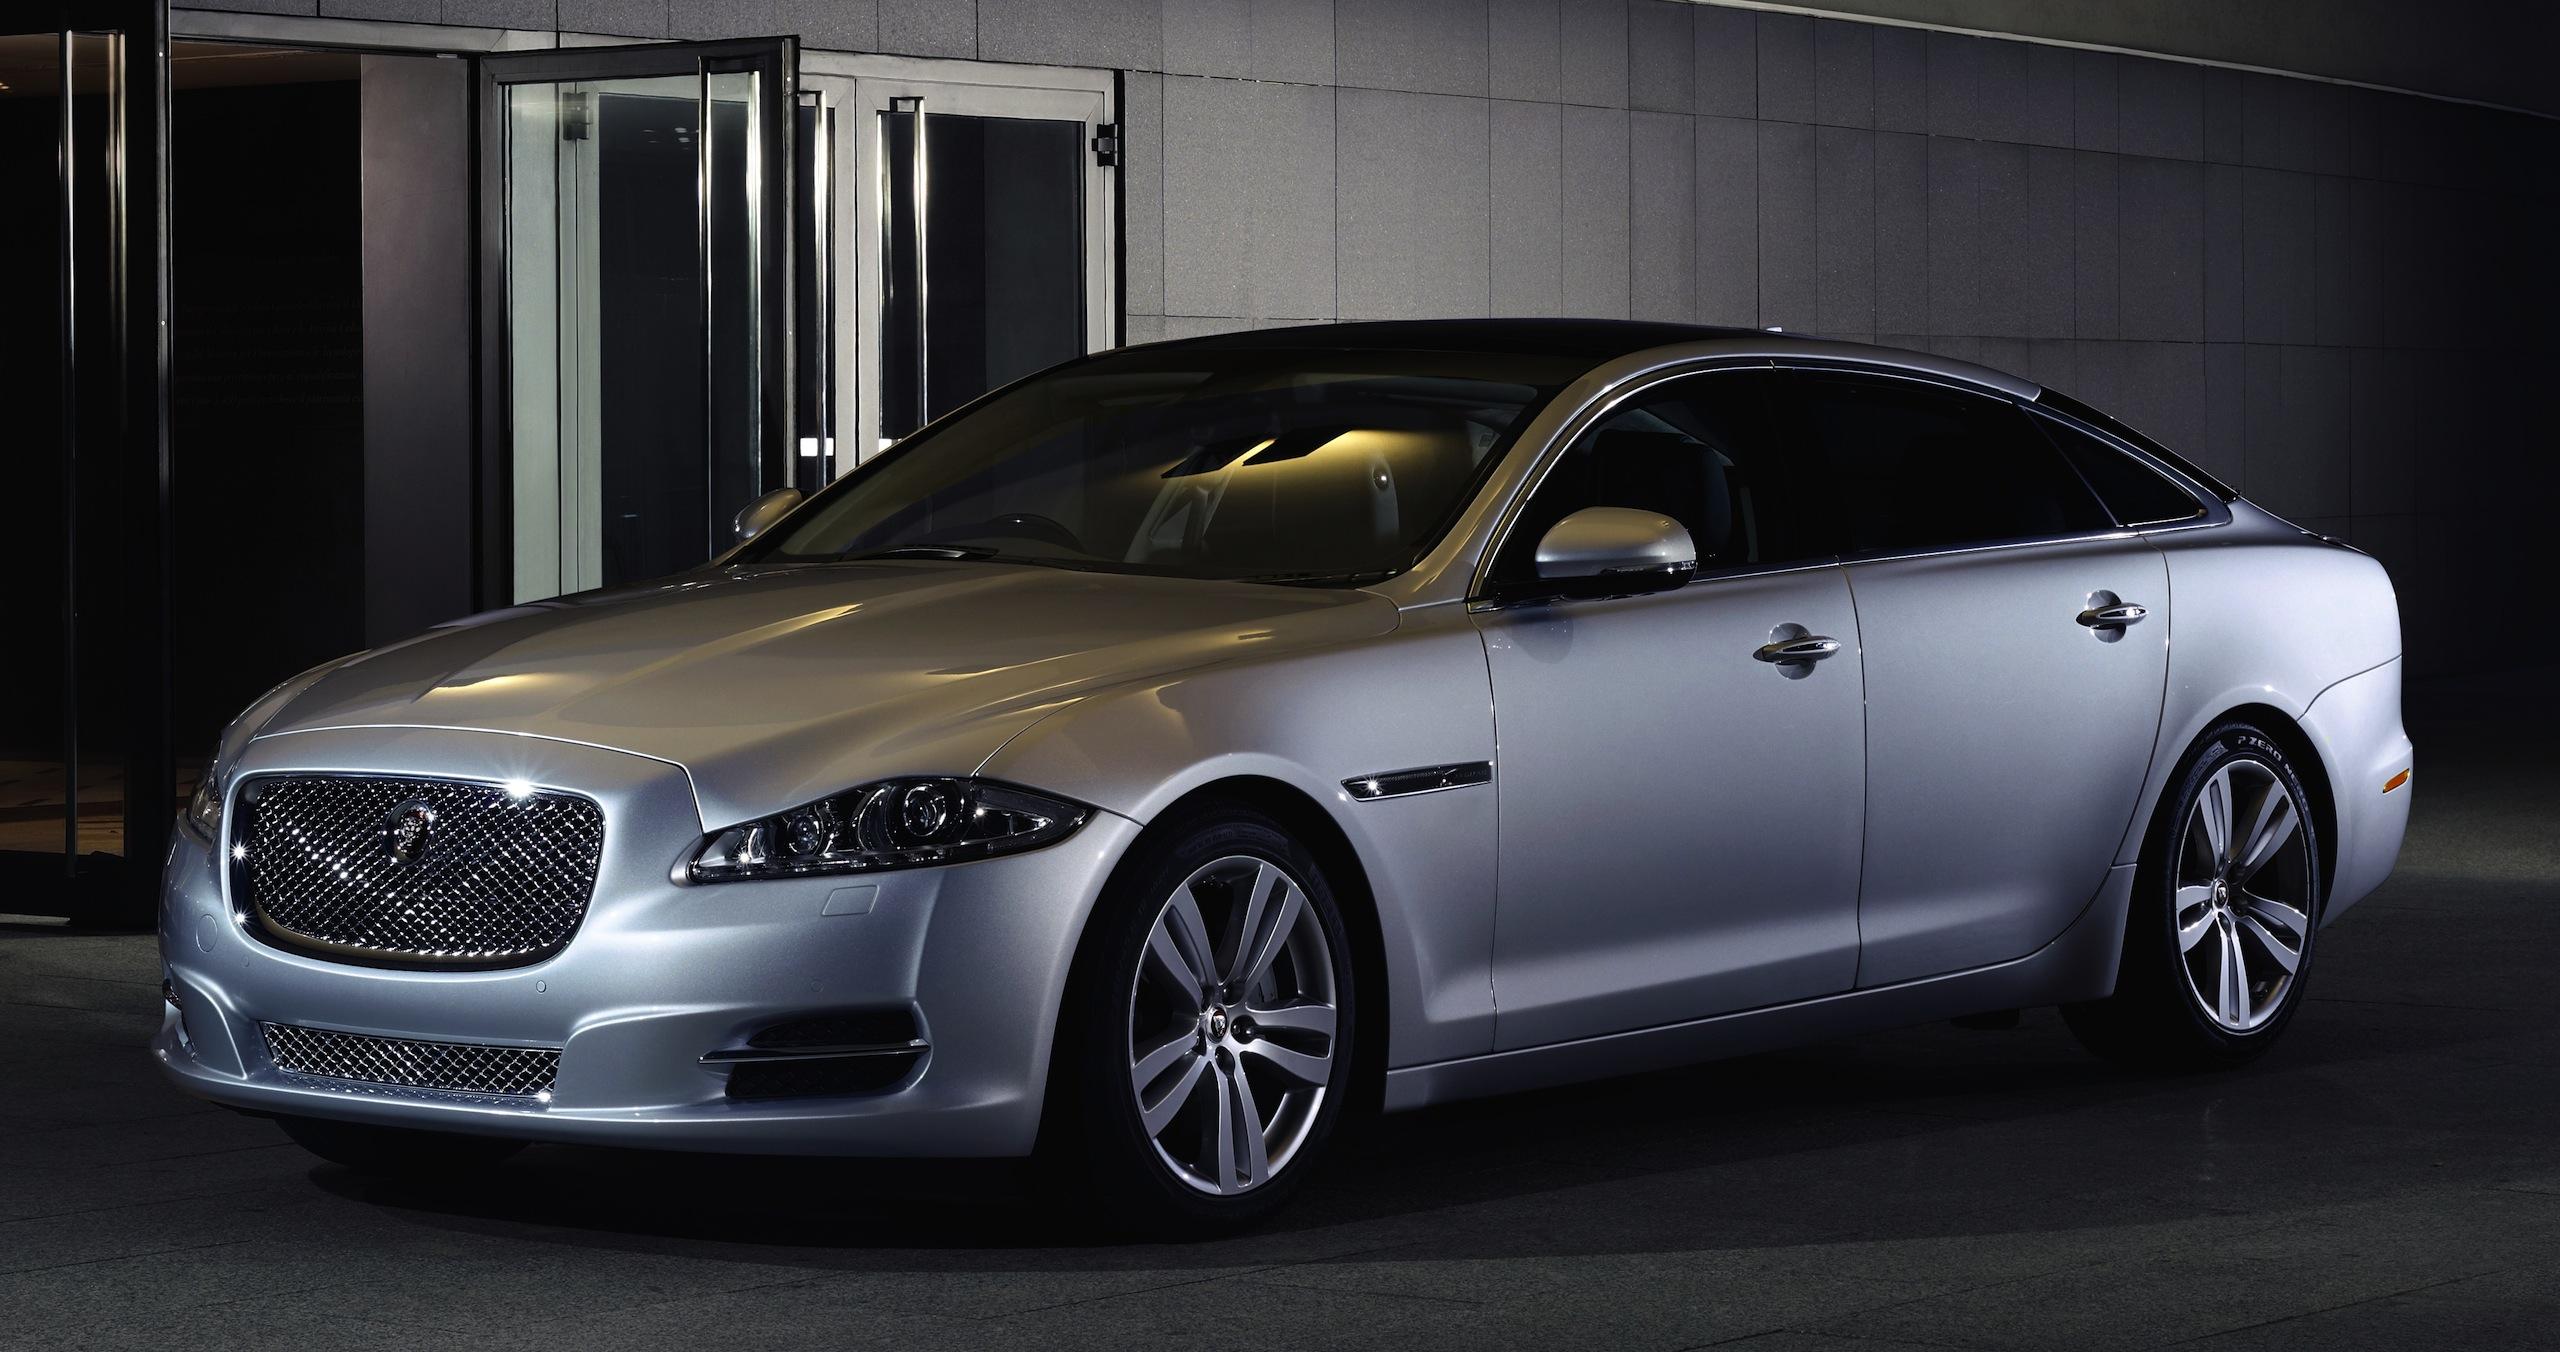 Jaguar Interior 2017 >> 2014 Jaguar XJ gets a host of interior upgrades Image 193906